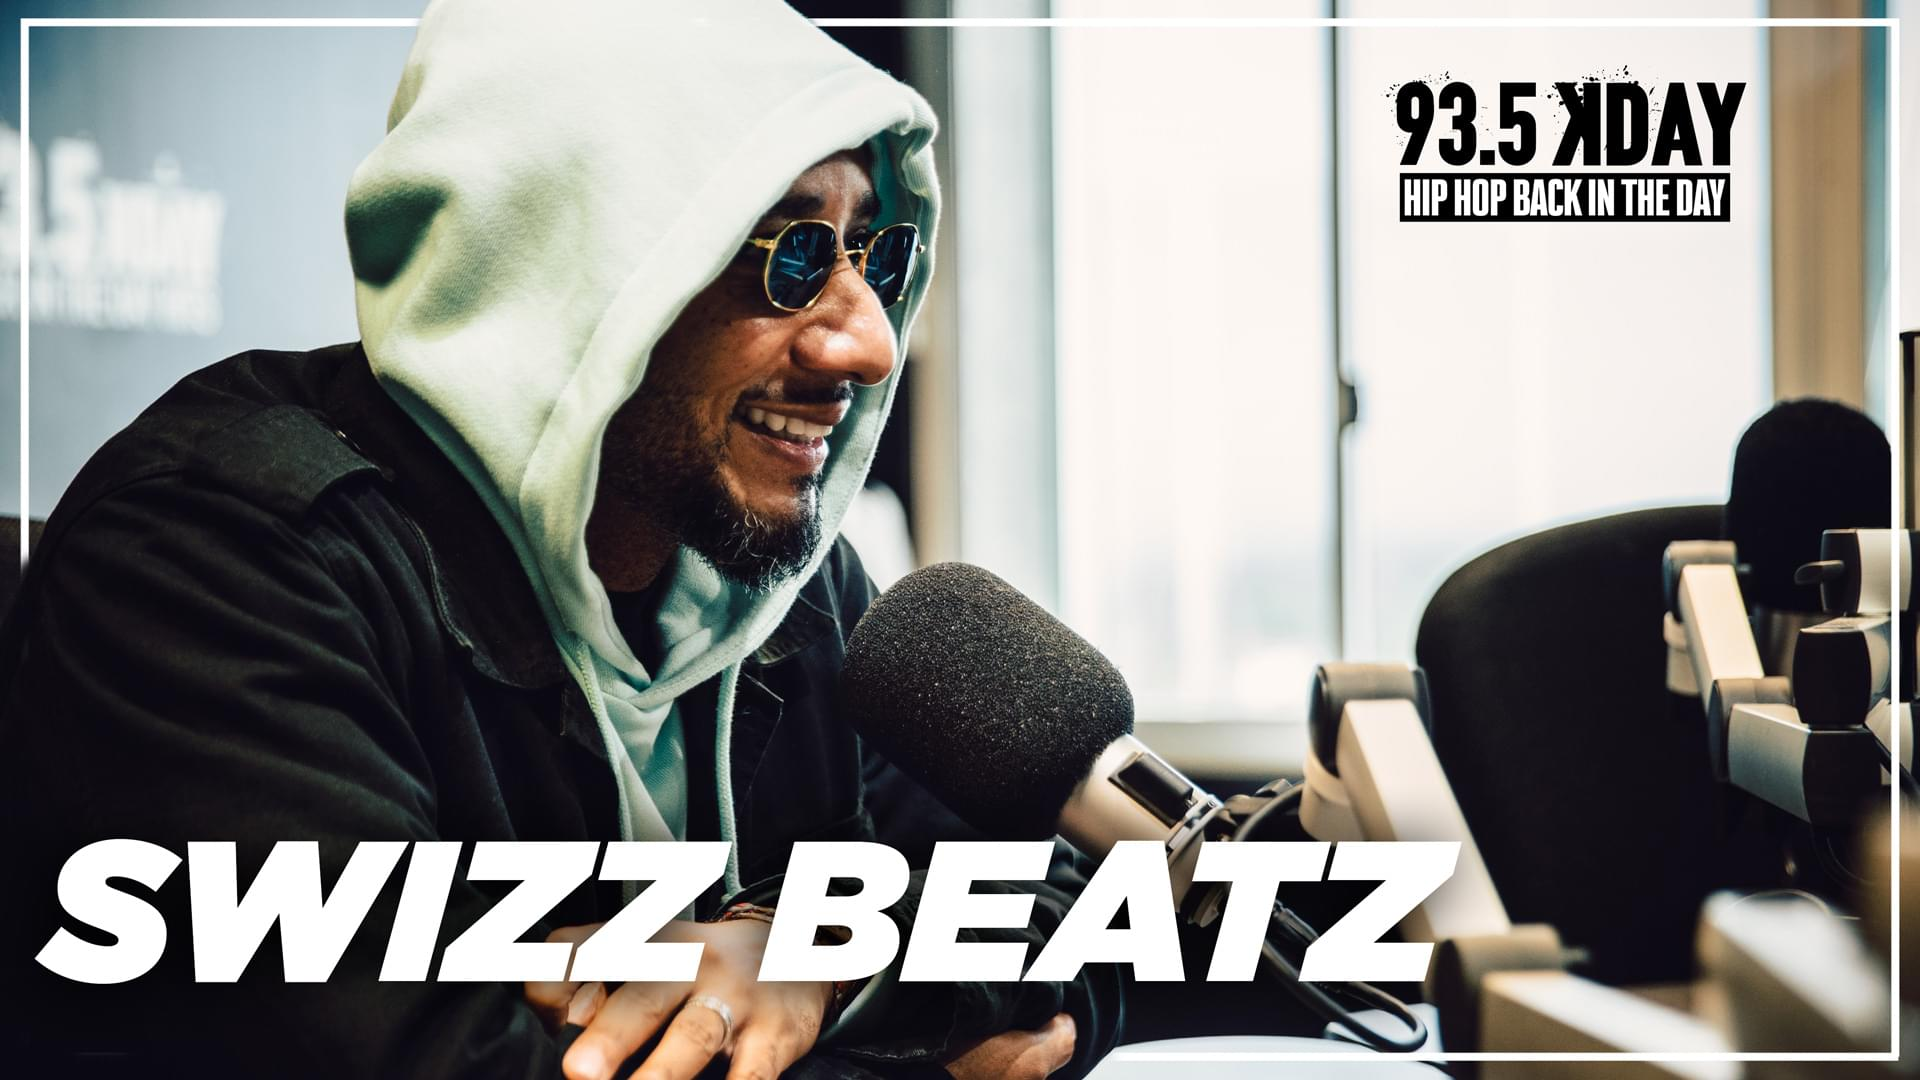 swizz-beatz-on-meeting-dmx-producing-ruff-ryders-anthem-new-poison-album